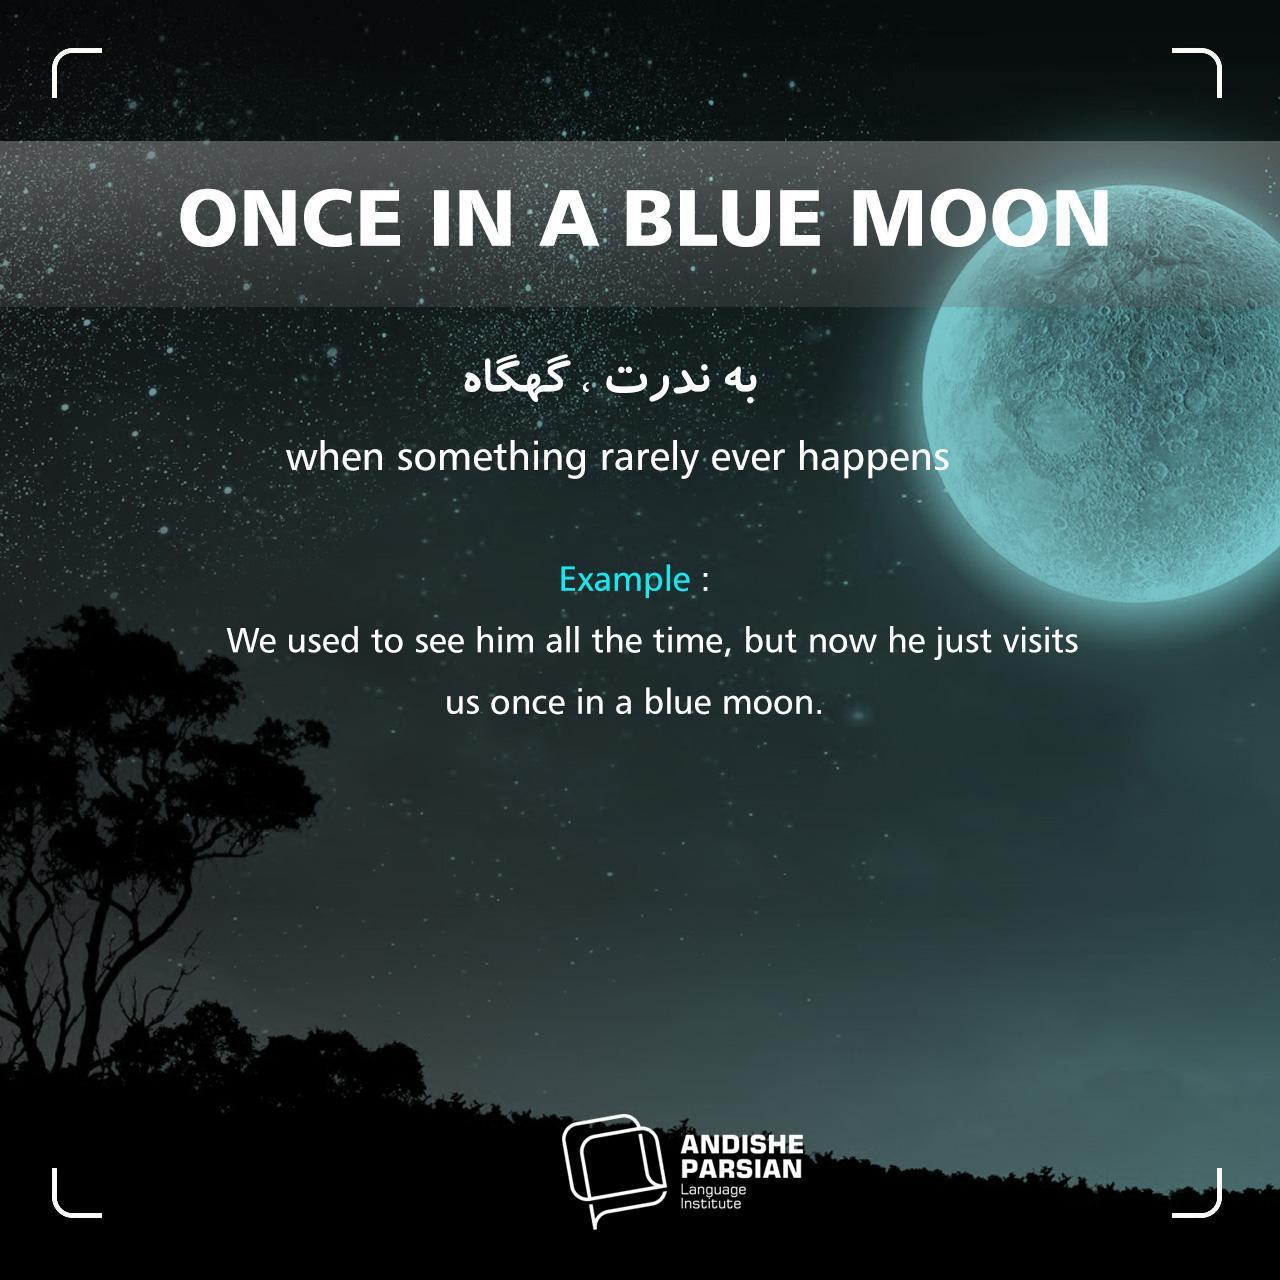 اندیشه پارسیان/ONCE IN A BLUE MOON